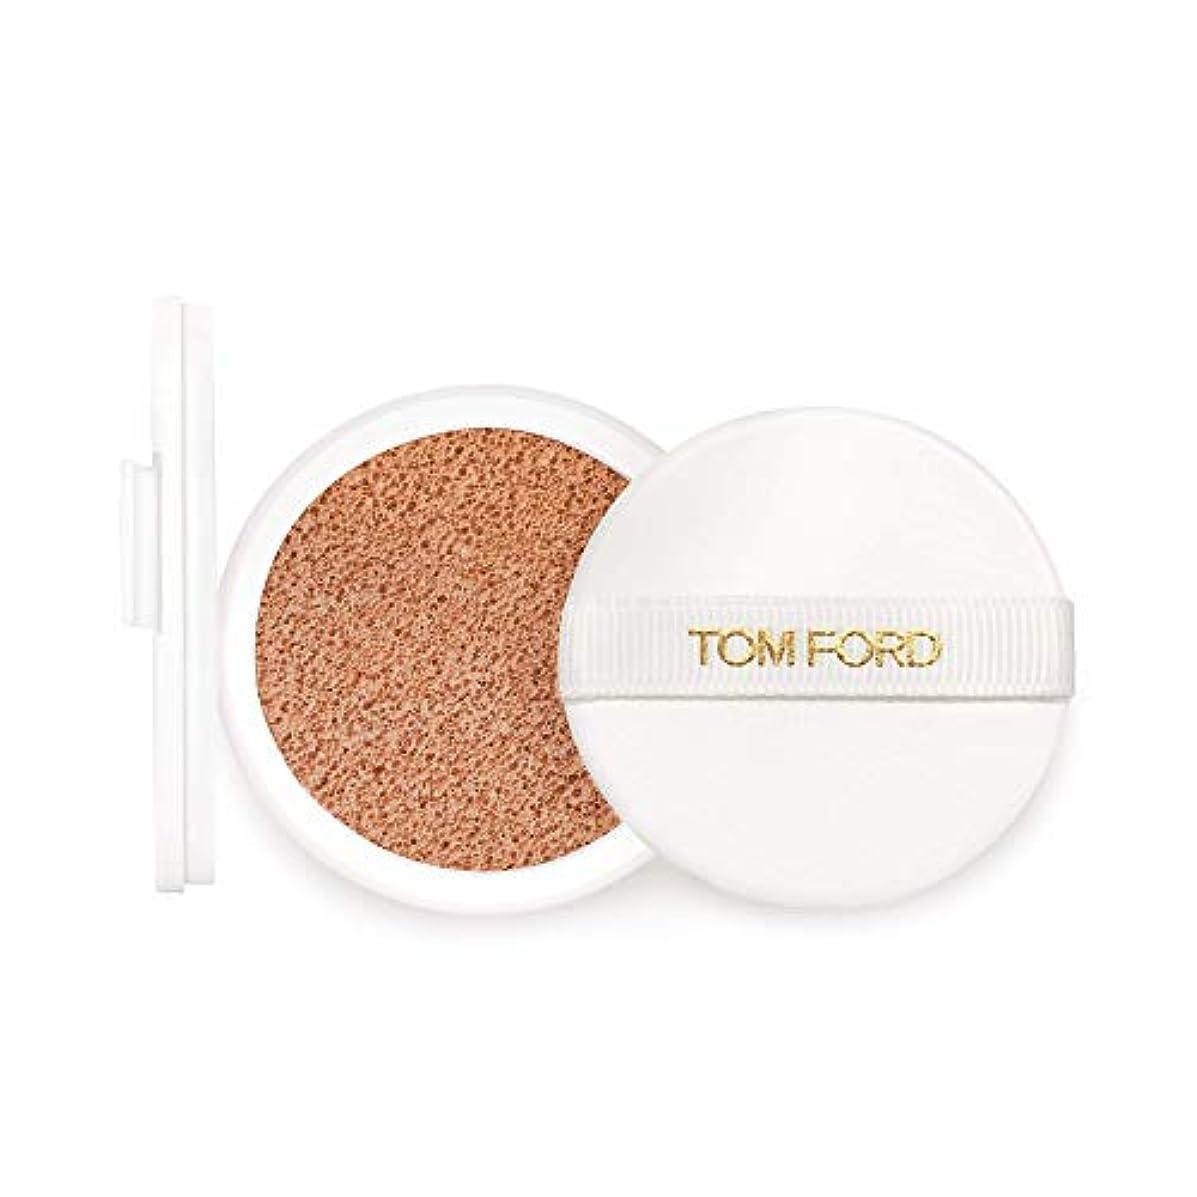 TOM FORD BEAUTY(トム フォード ビューティ) ソレイユ グロウ トーン アップ ファンデーション SPF40 ハイドレーティング クッション コンパクト 12g (1 ローズ グロウ トーン アップ)